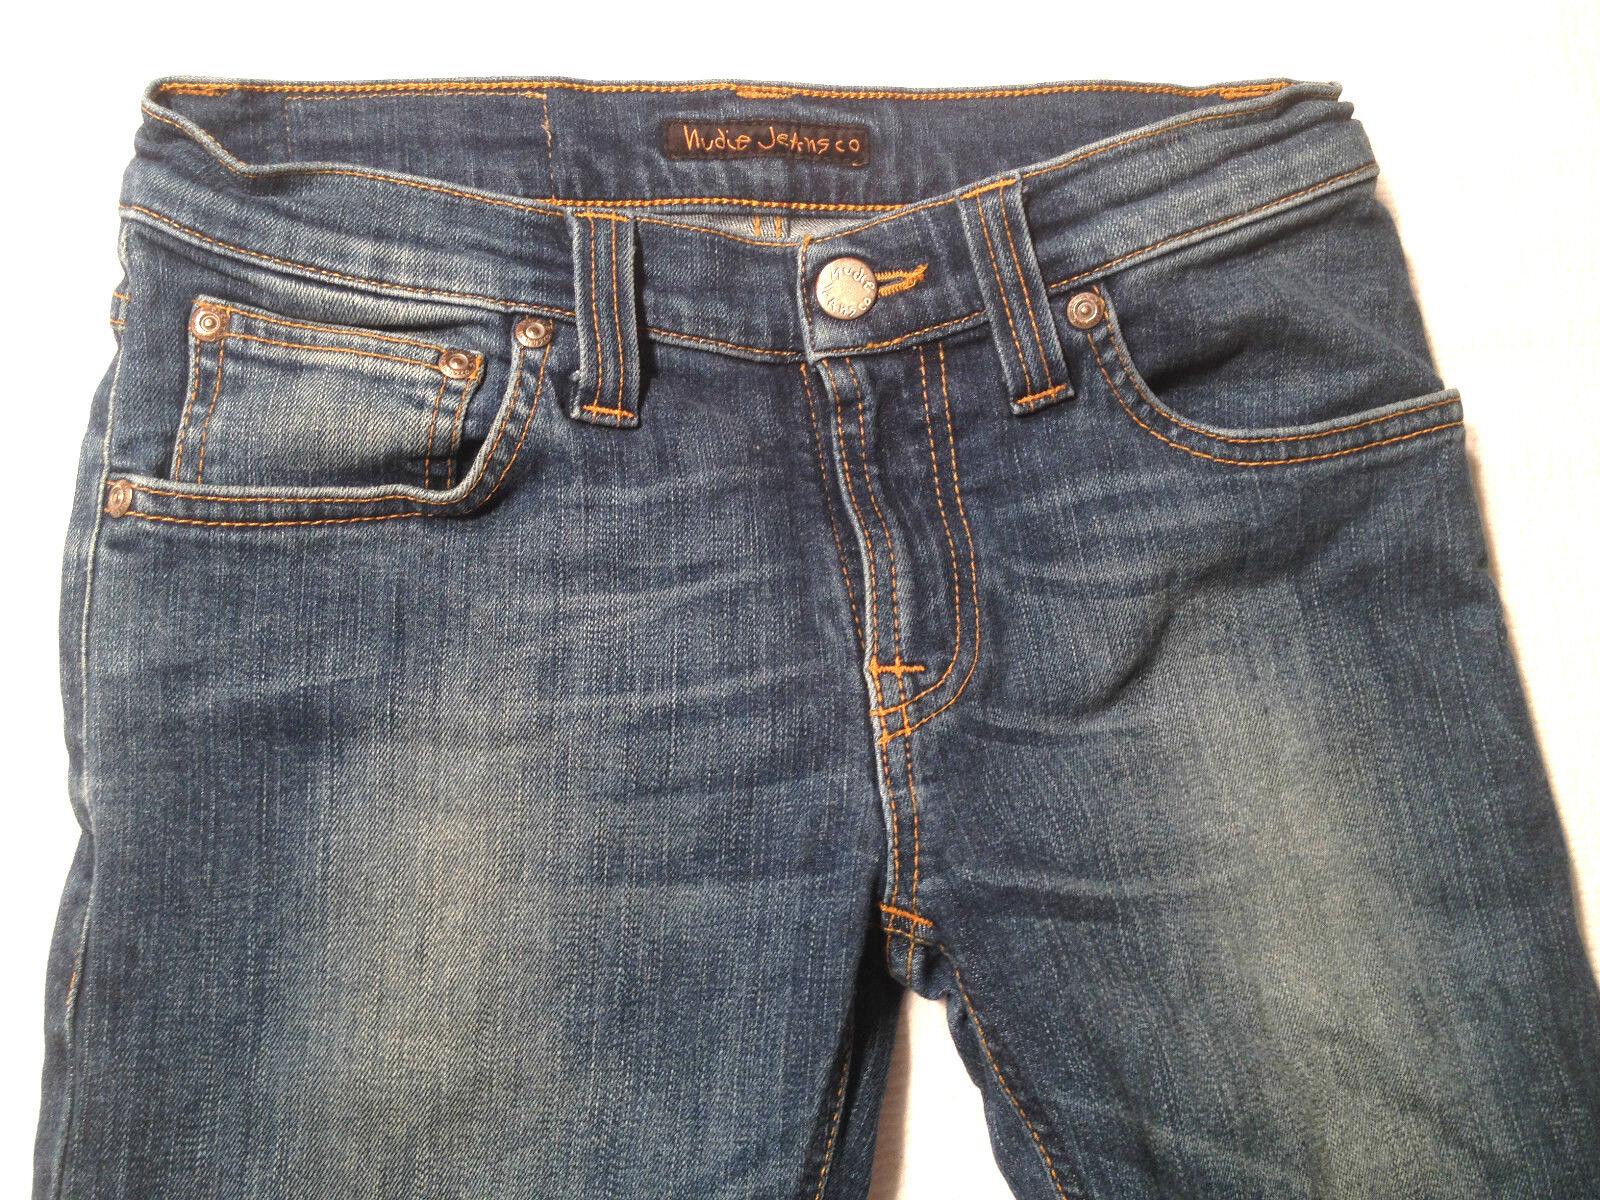 NUDIE Jeans 'TIGHT LONG JOHN BRIGHT blueE' W24 L32 AU6 US2 UK4 Womens or Girls